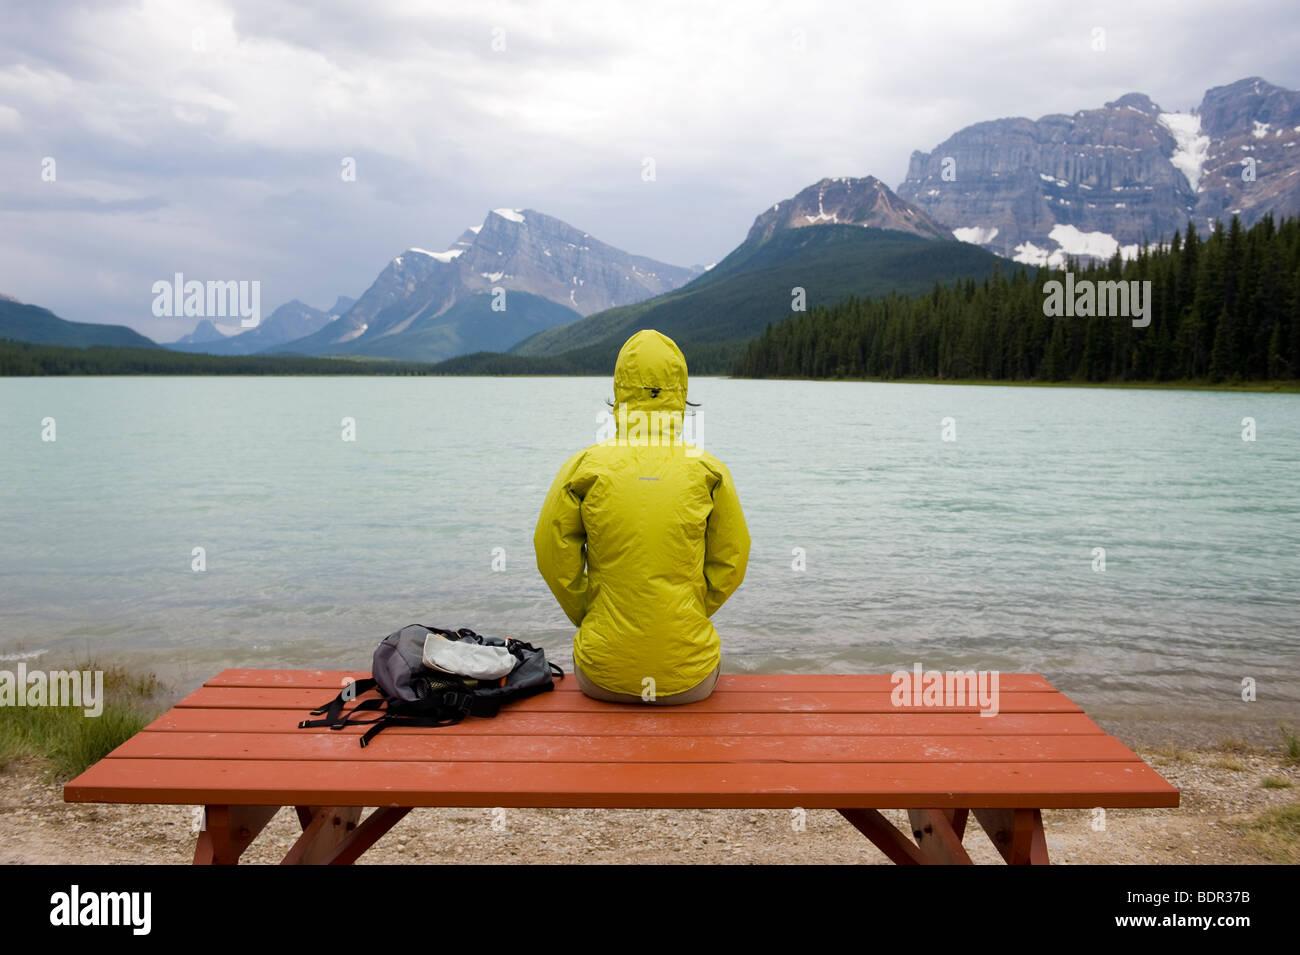 Picnic table at Waterfowl Lakes, Banff National Park, Alberta, Canada - Stock Image